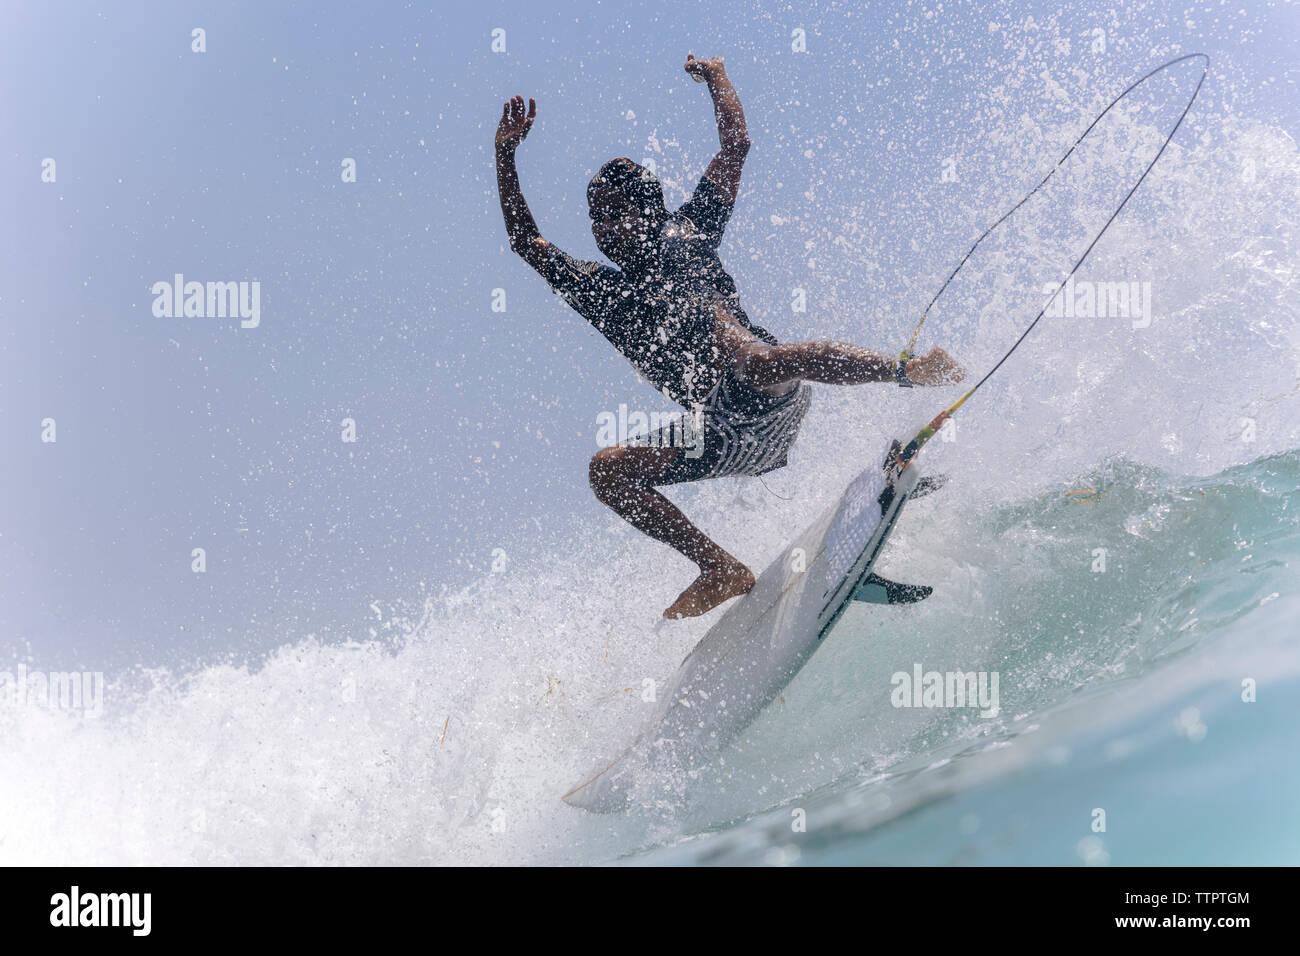 Full length of man surfing in sea against sky - Stock Image